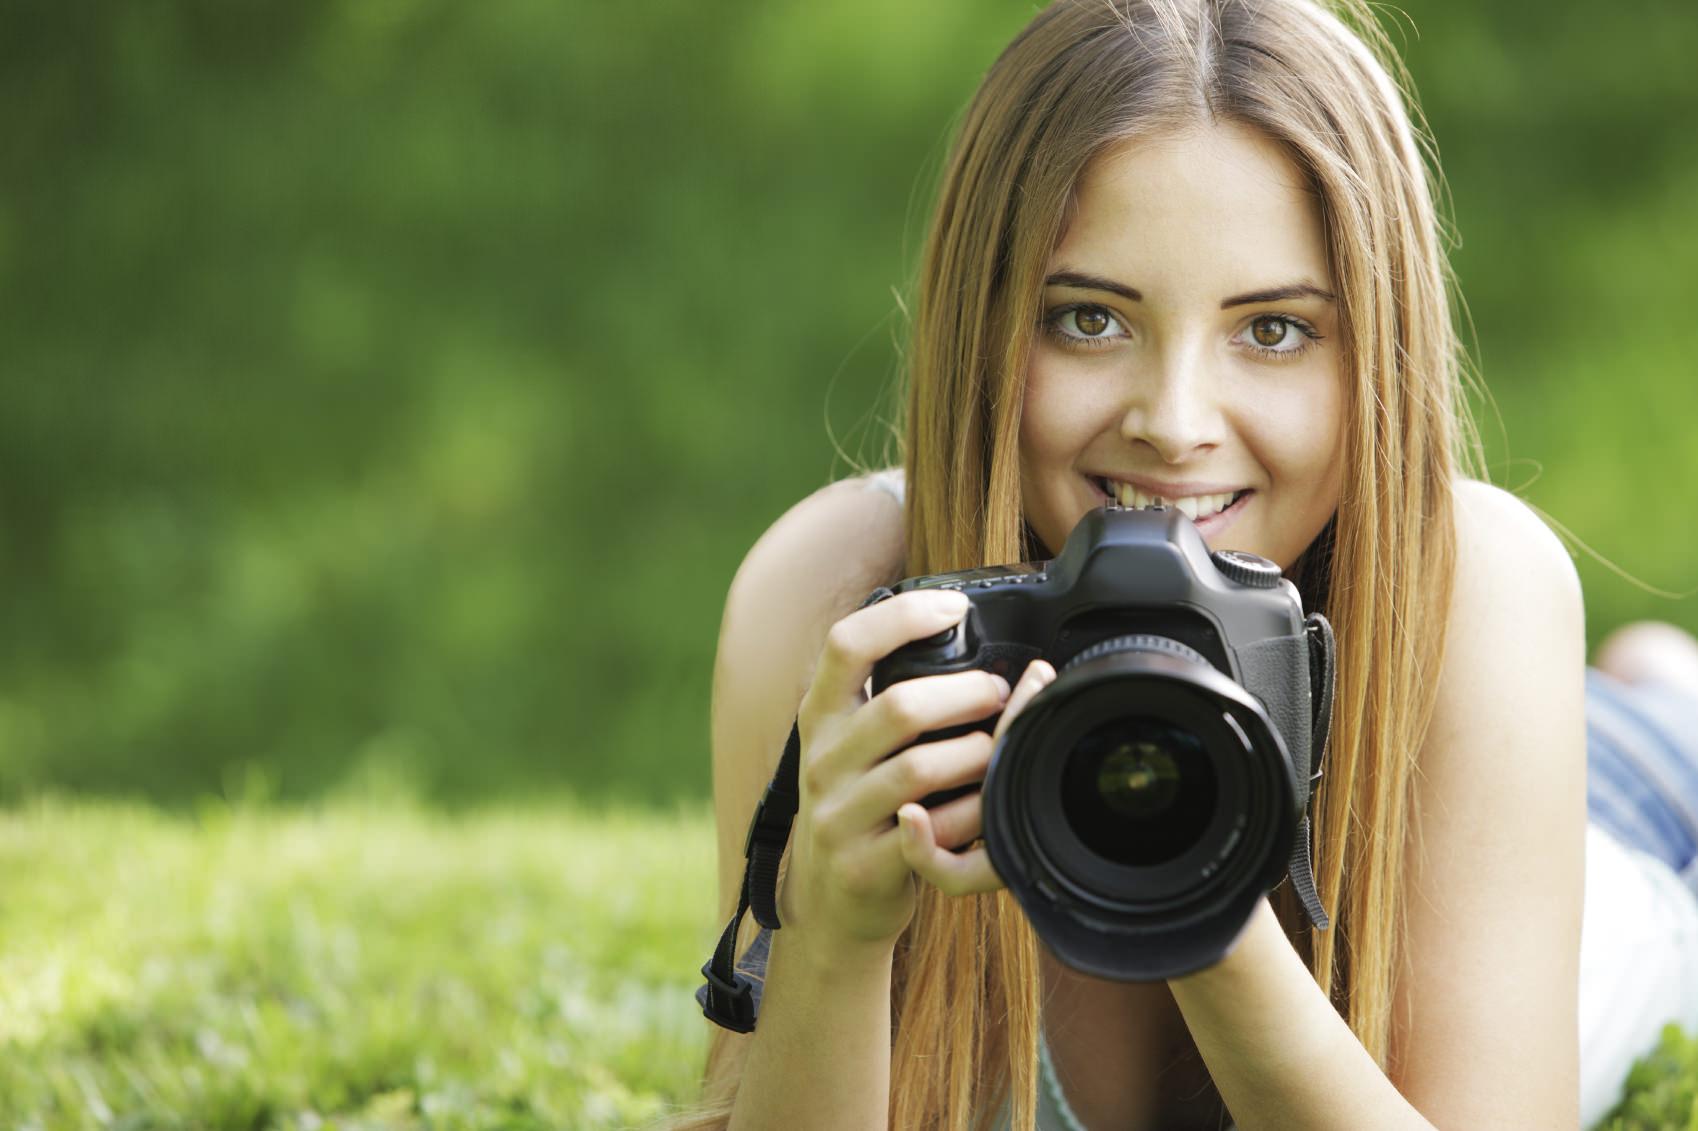 Professional Photographer Dubai, UAE BIPP Qualified Learn to be a professional photographer